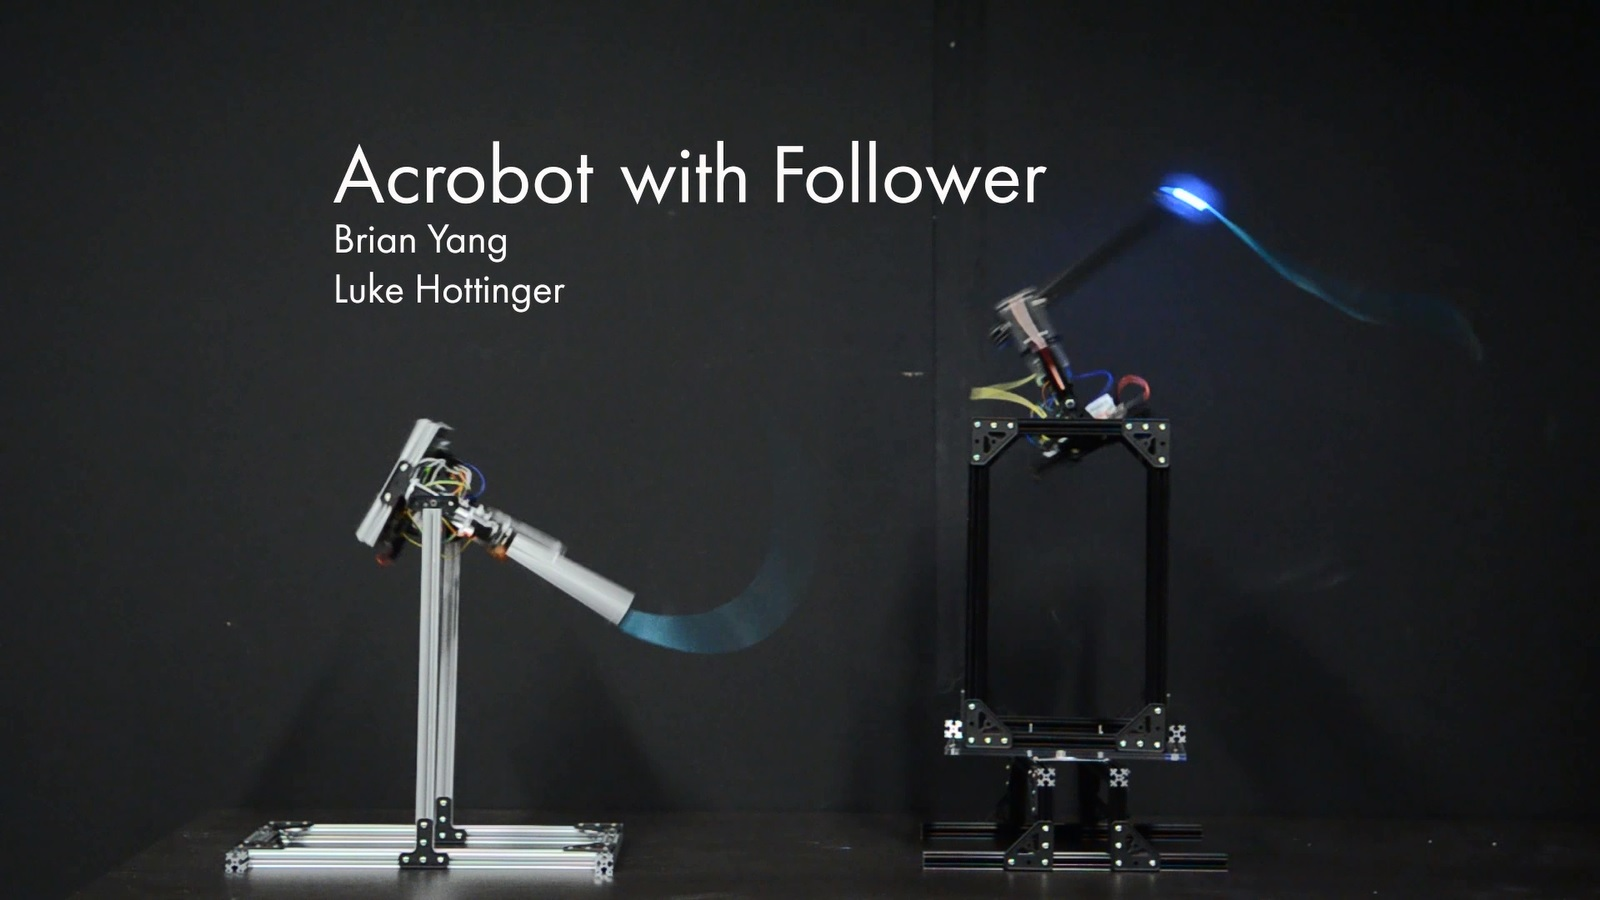 Acrobot with follower